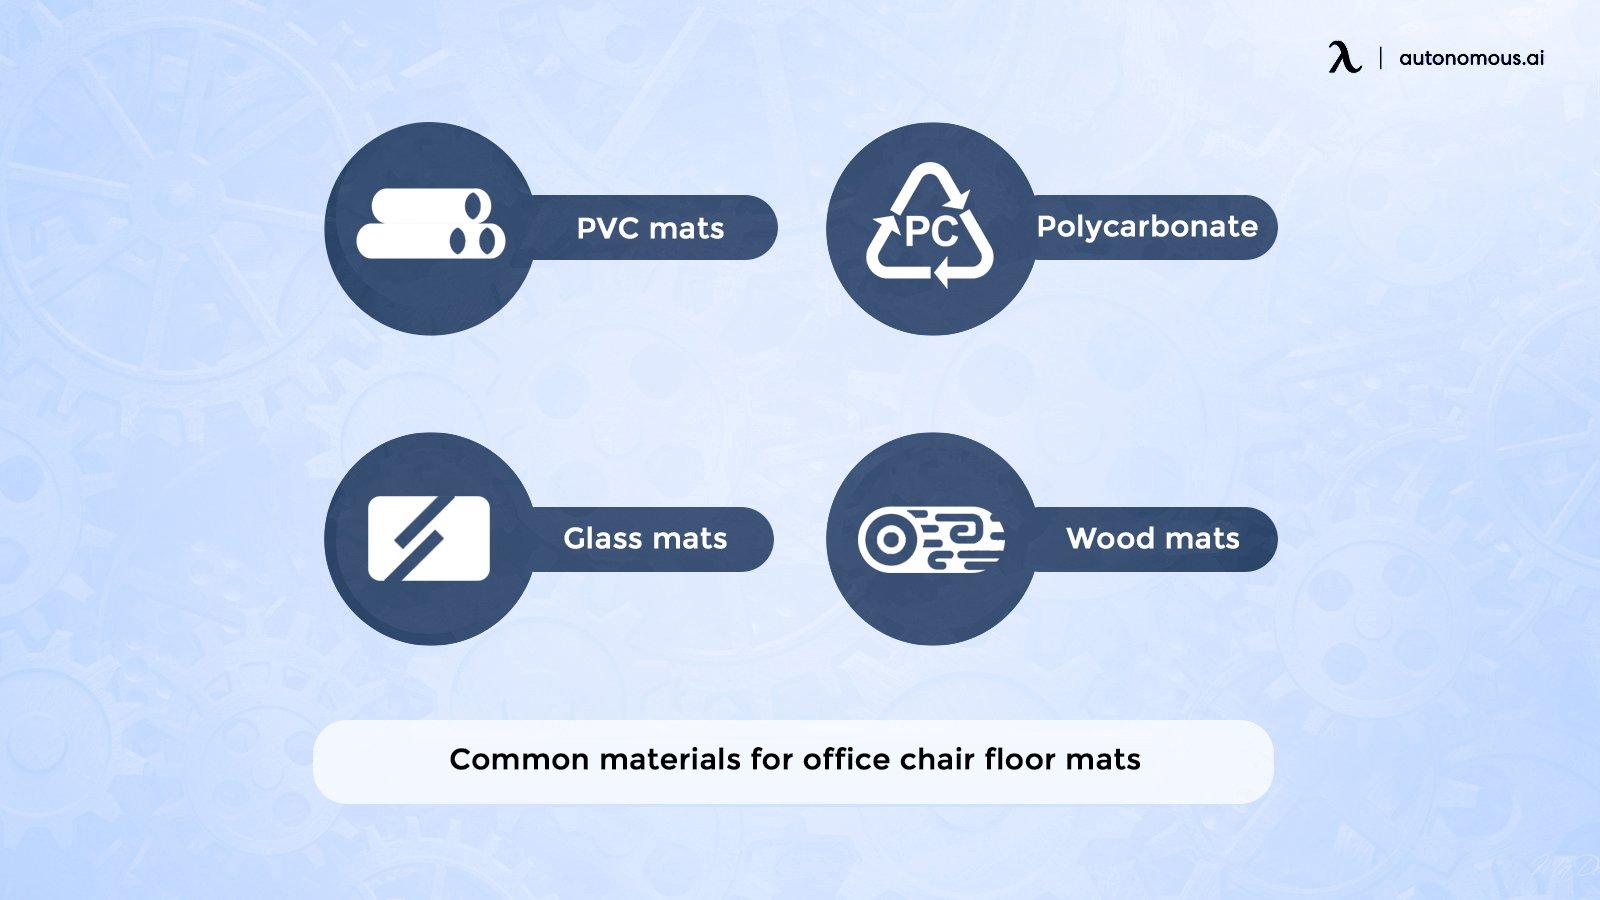 Floor mat materials